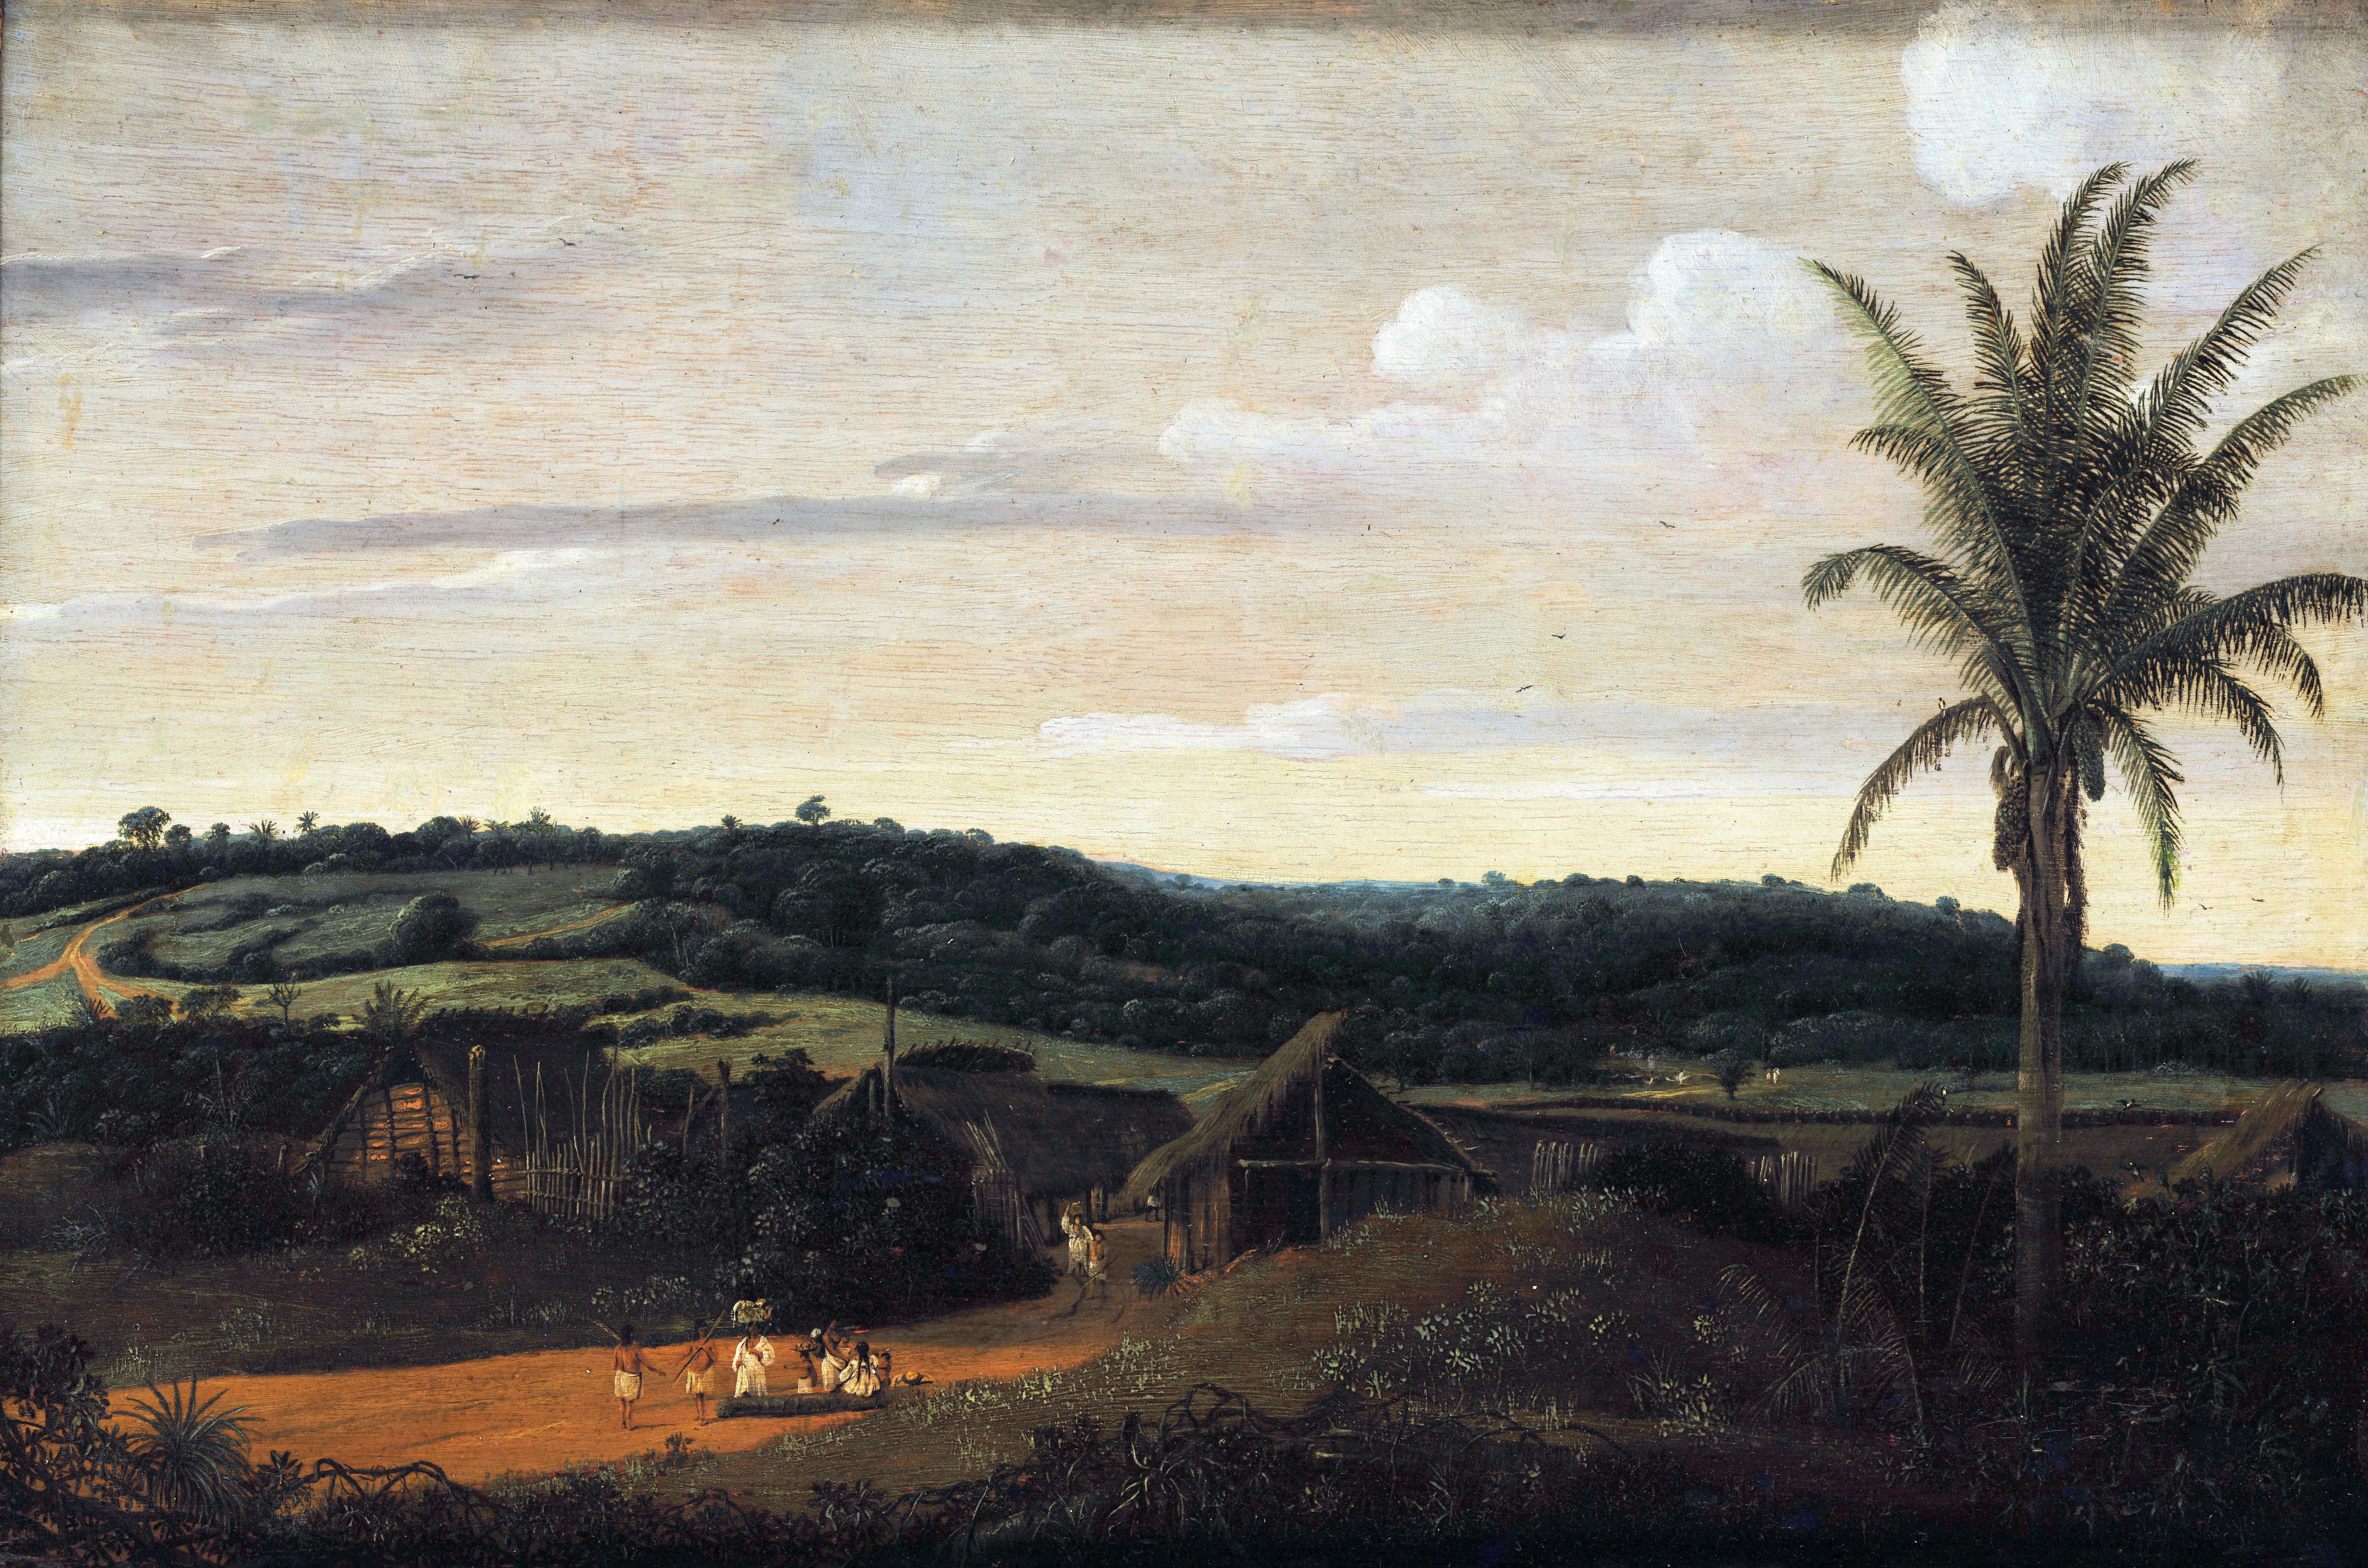 File:Frans Post - Mocambos, c. 1659.jpg